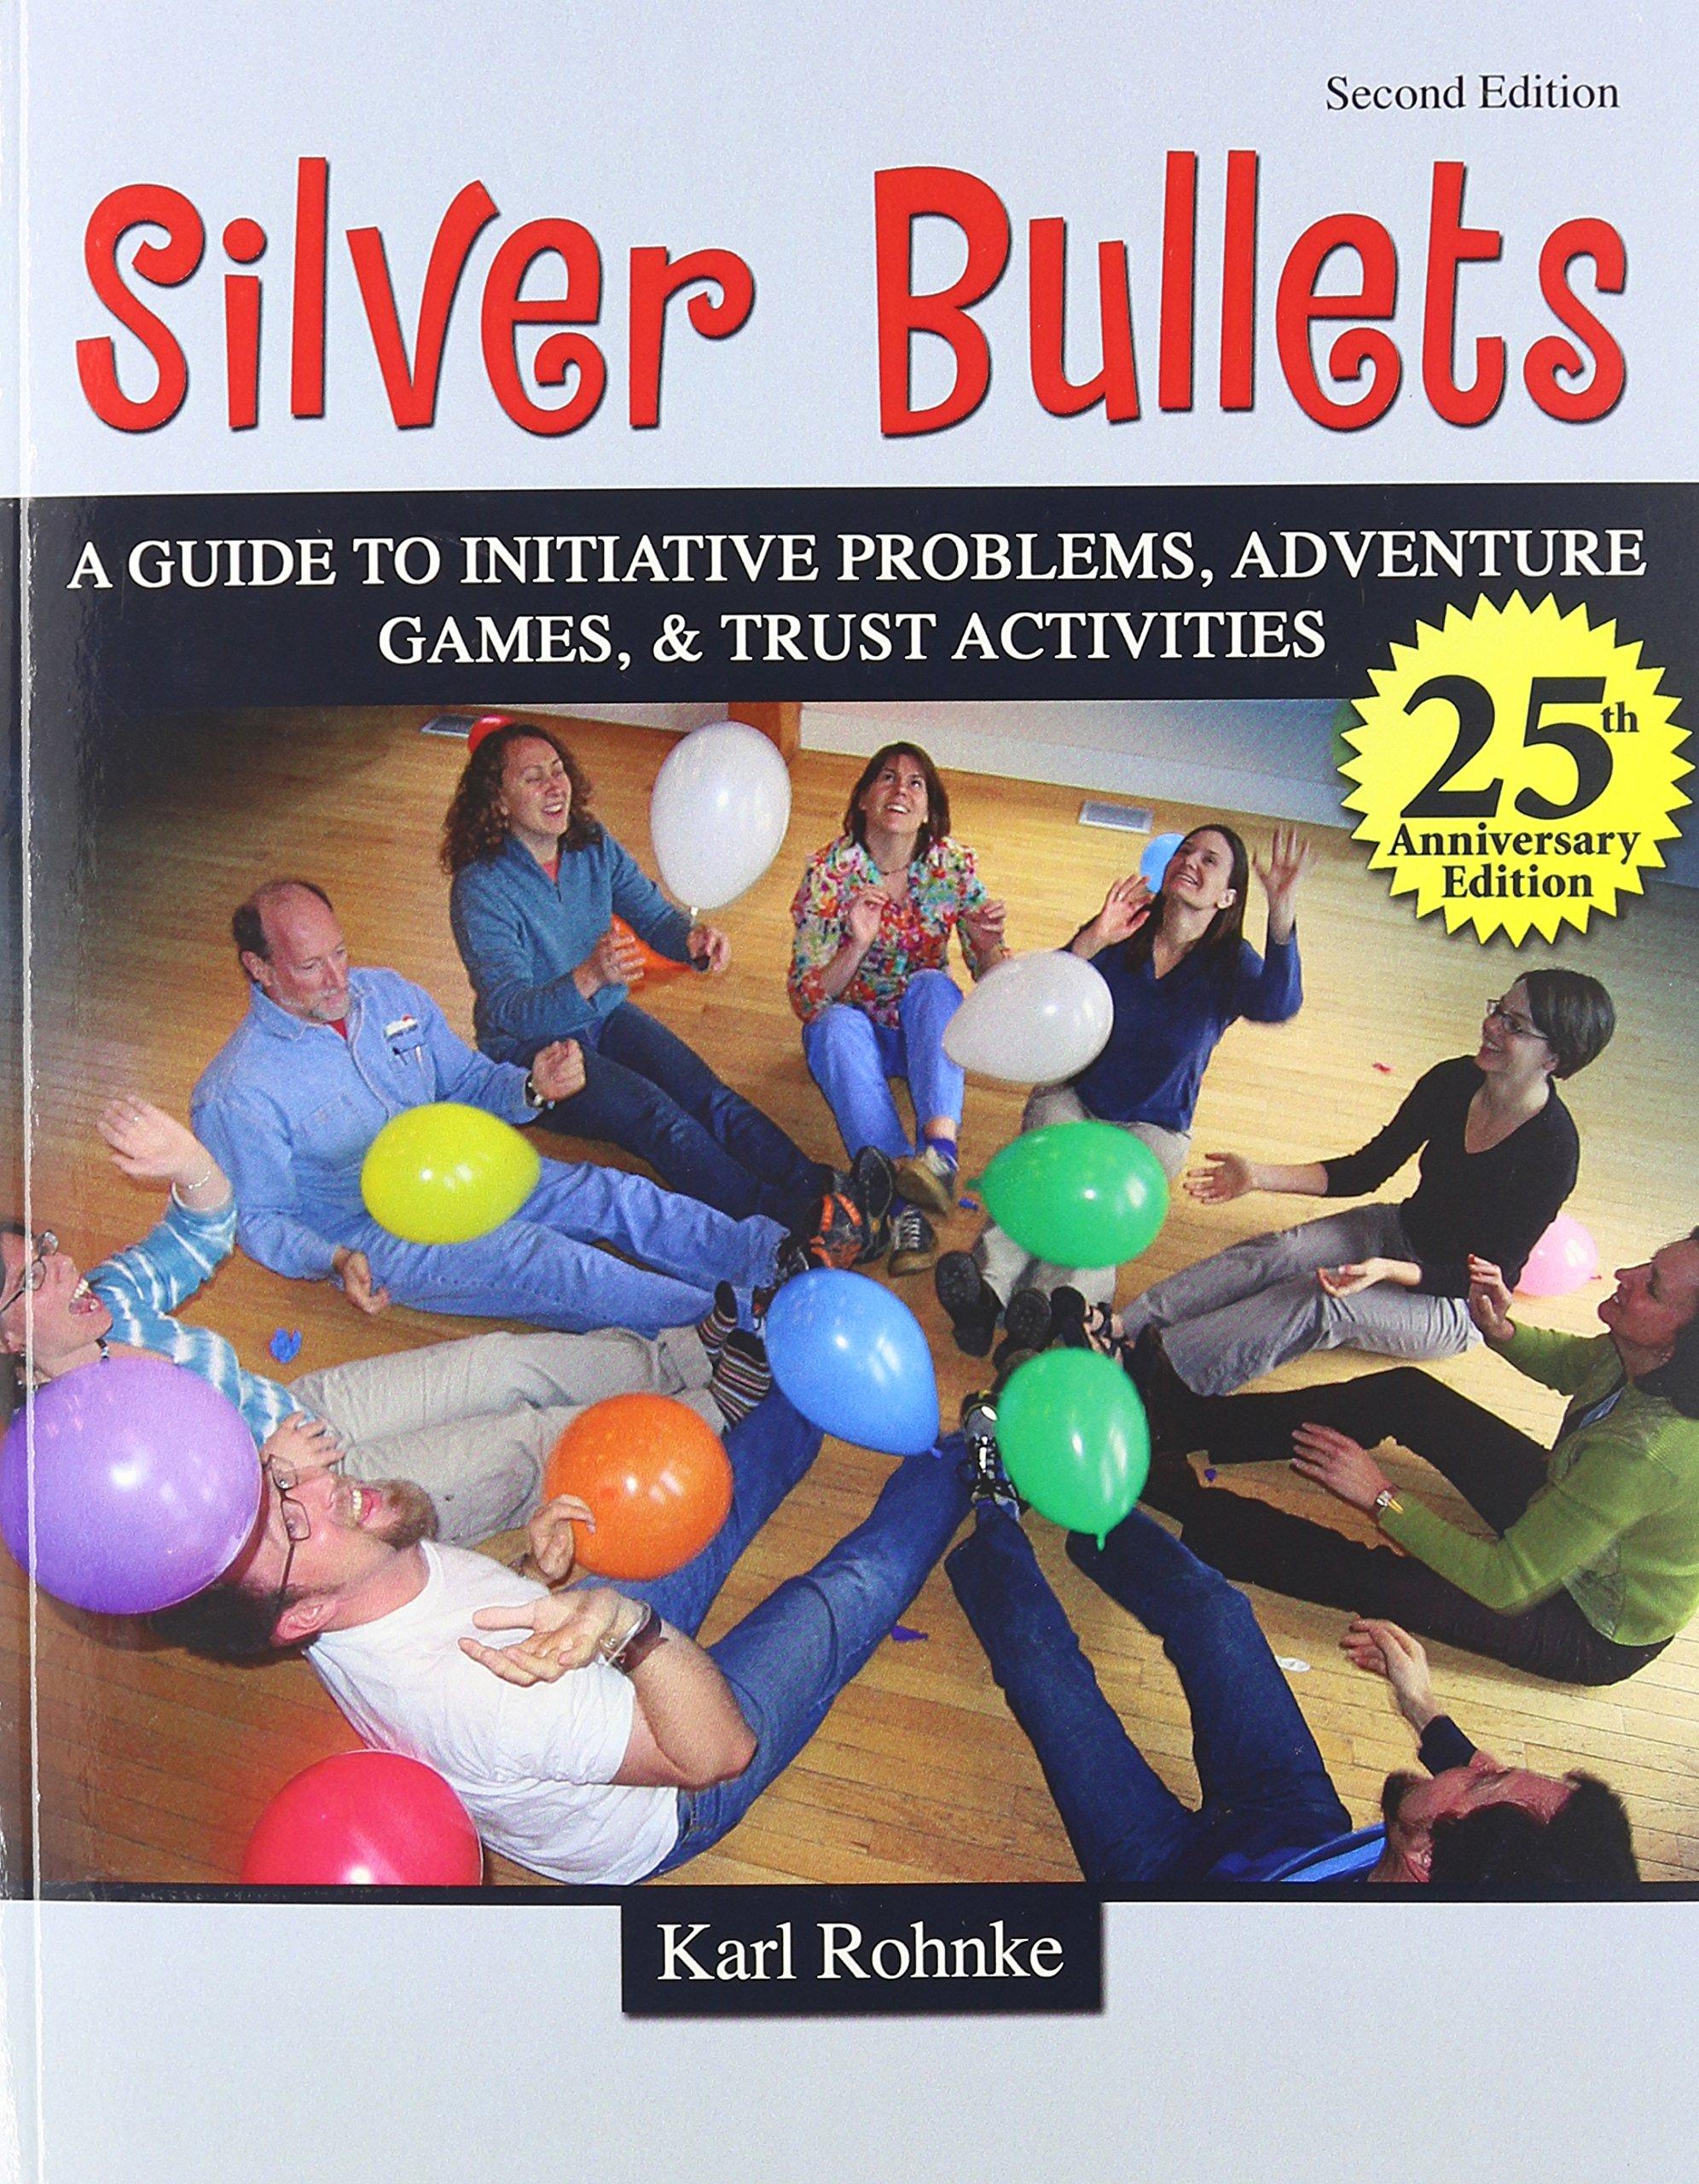 silverbullets